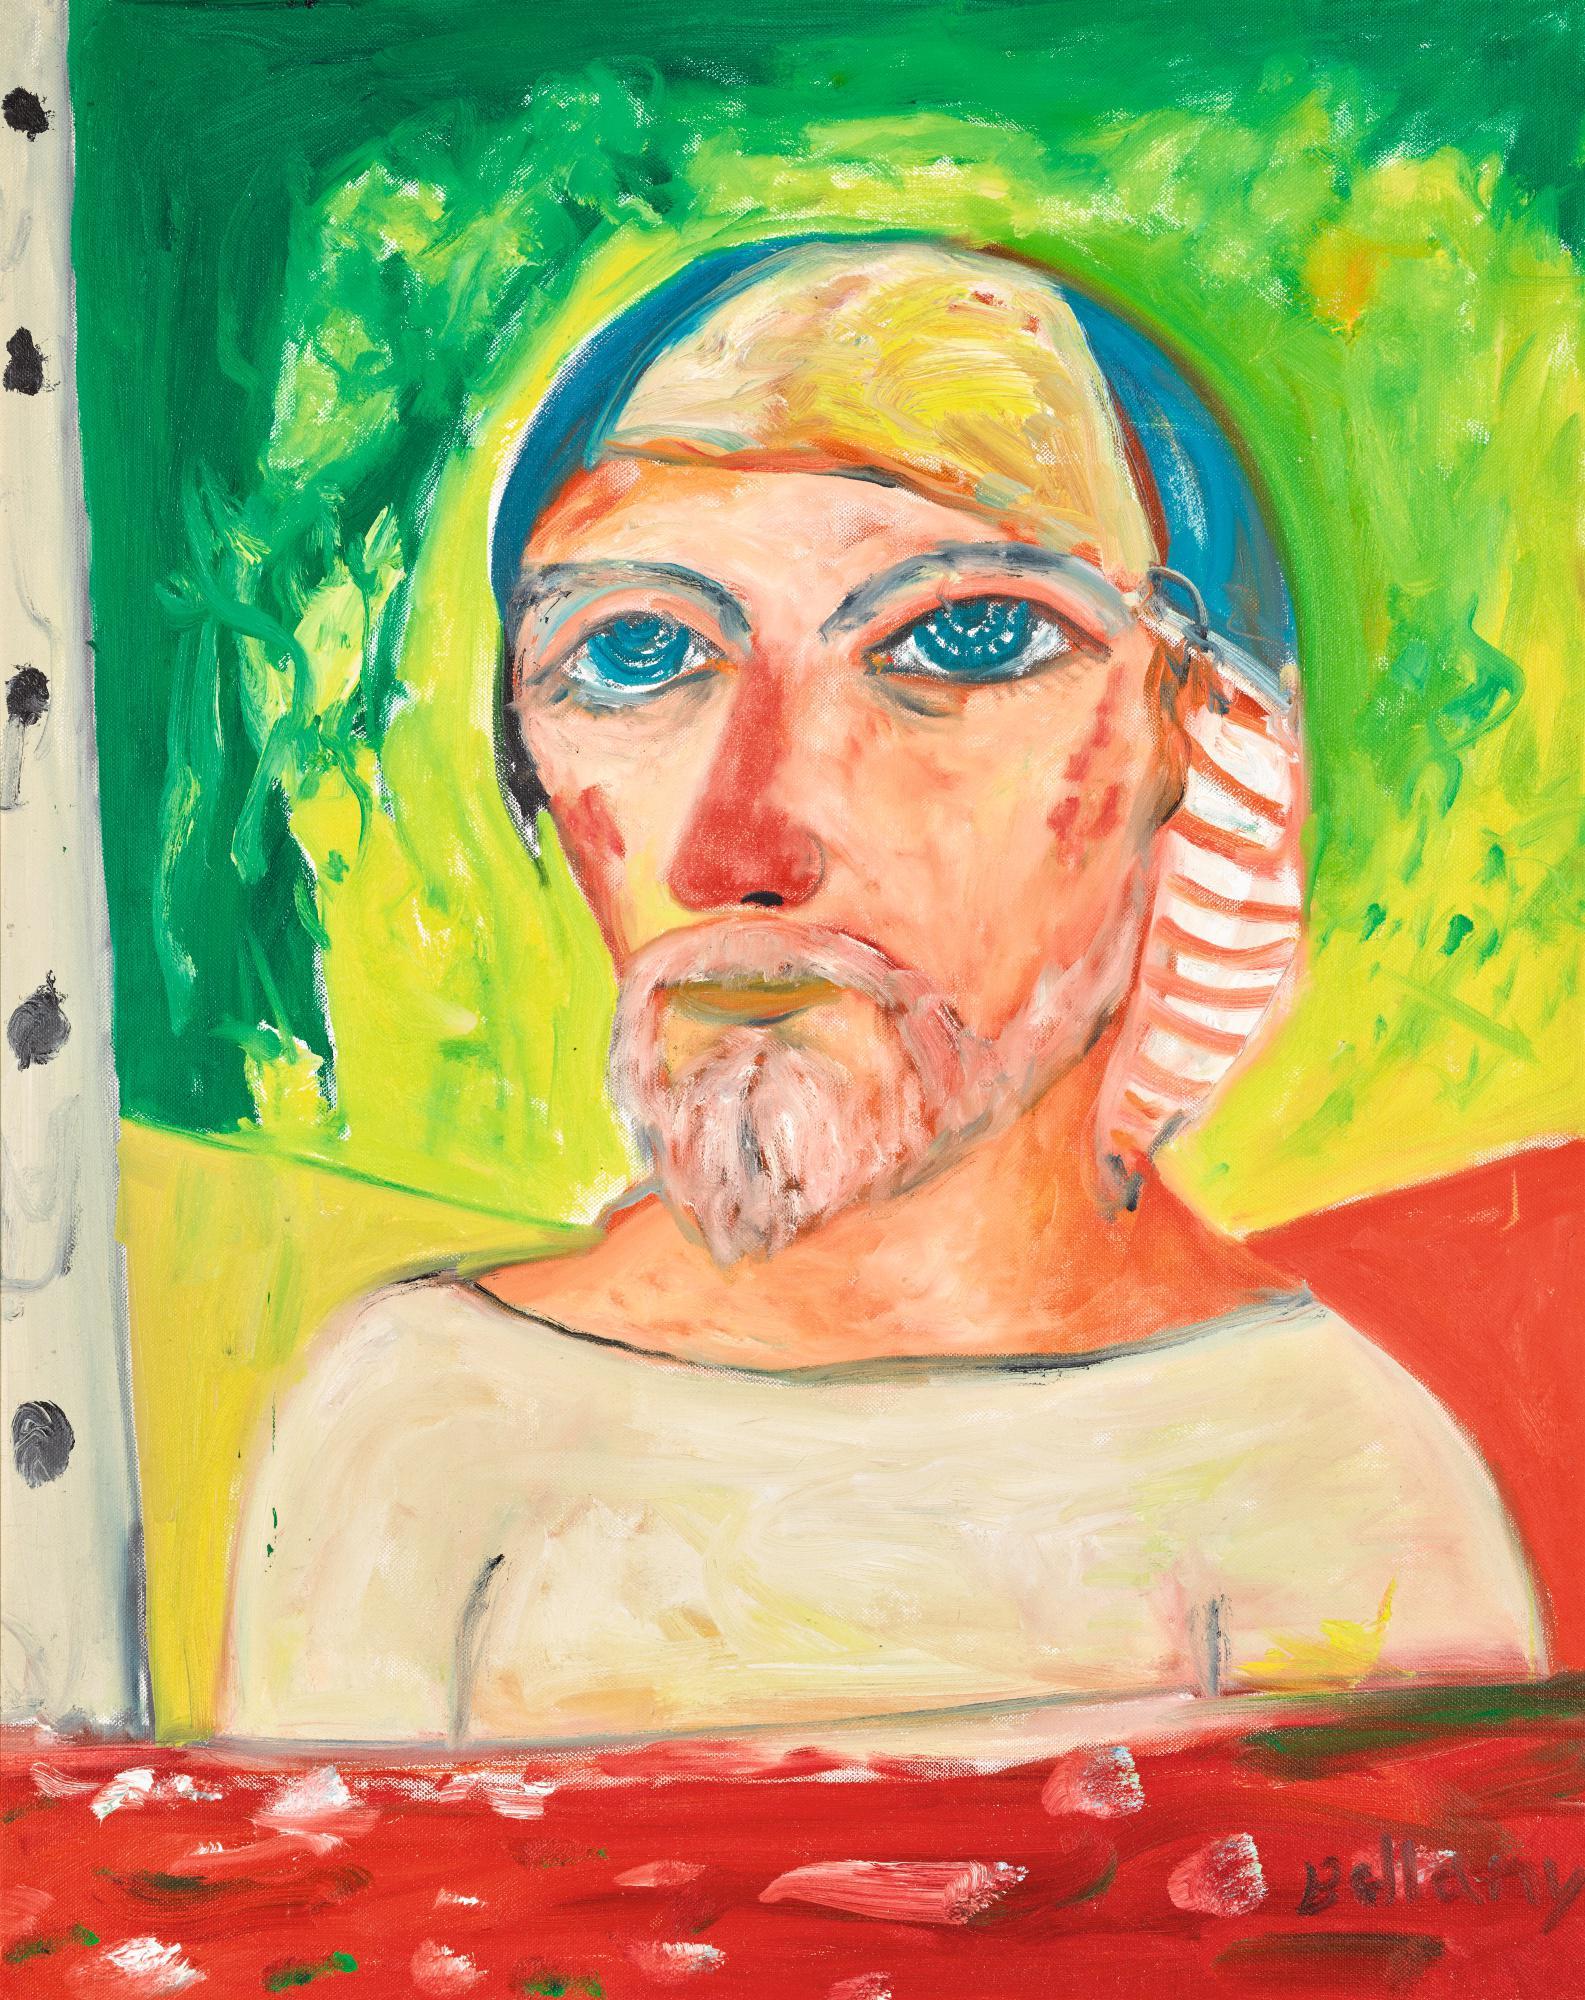 JOHN BELLANY, R.A. | SELF PORTRAIT